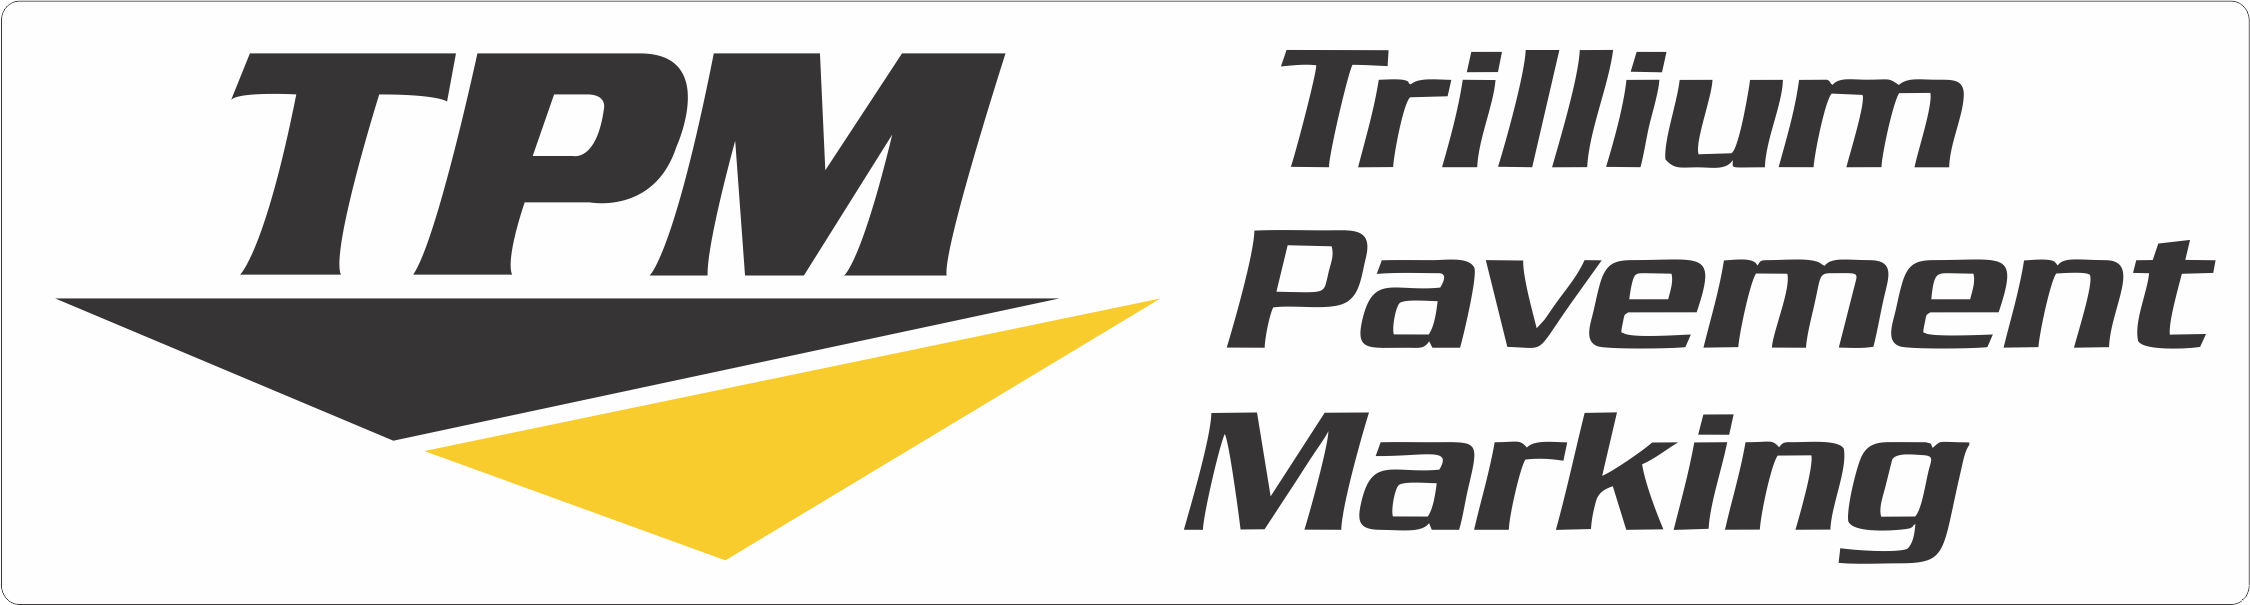 Trillium Pavement Marking